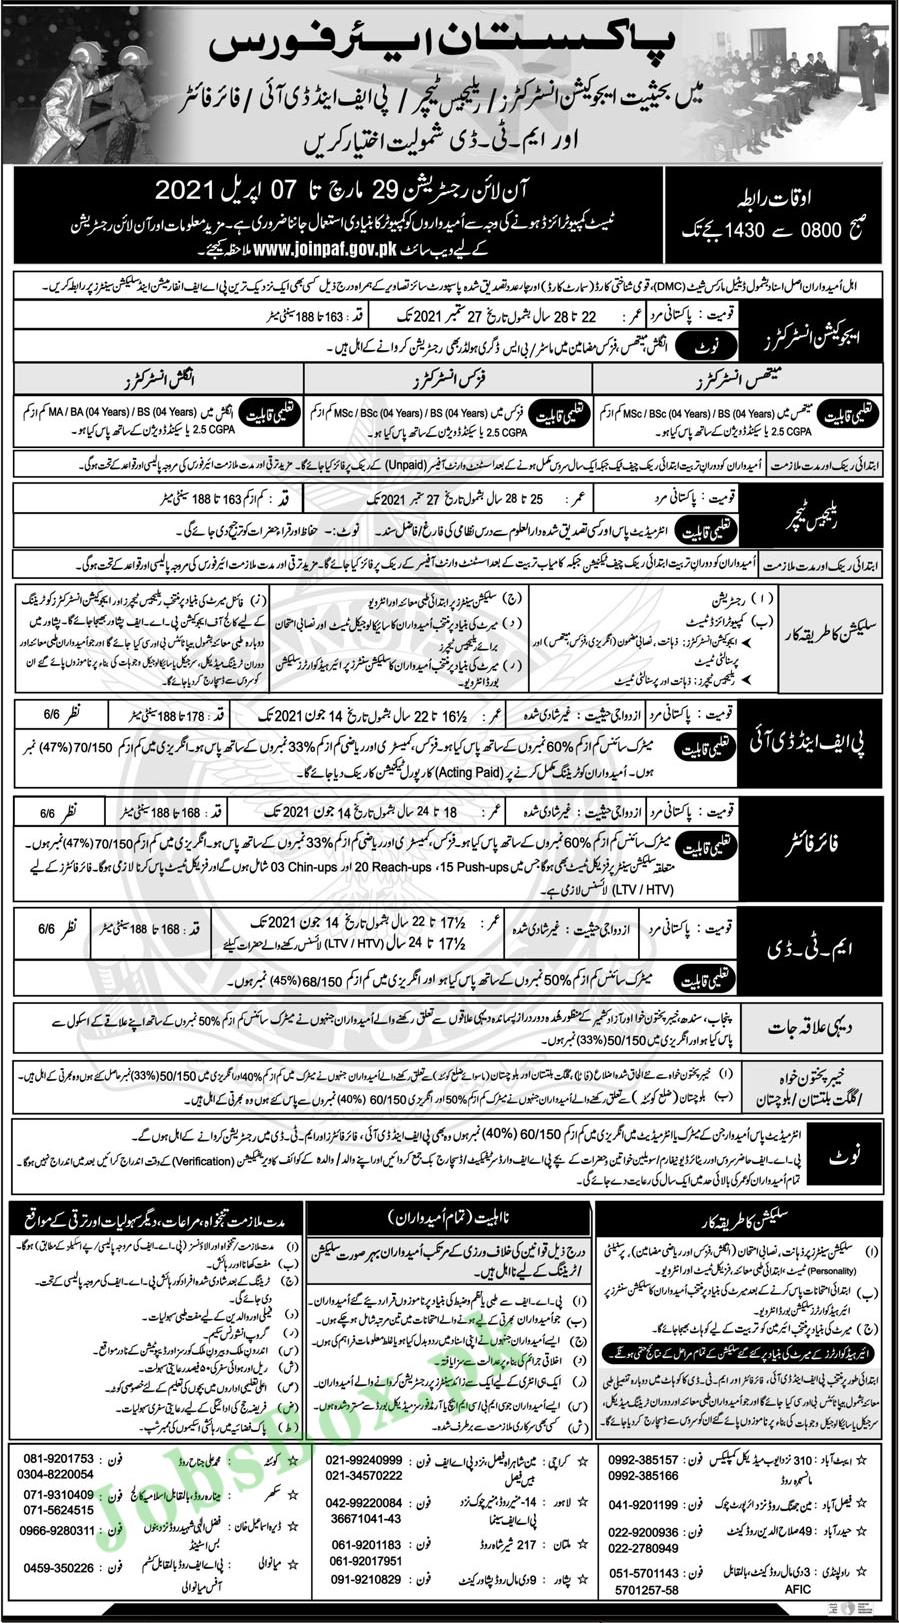 Latest Pakistan Air Force PAF Jobs 2021 Advertisement